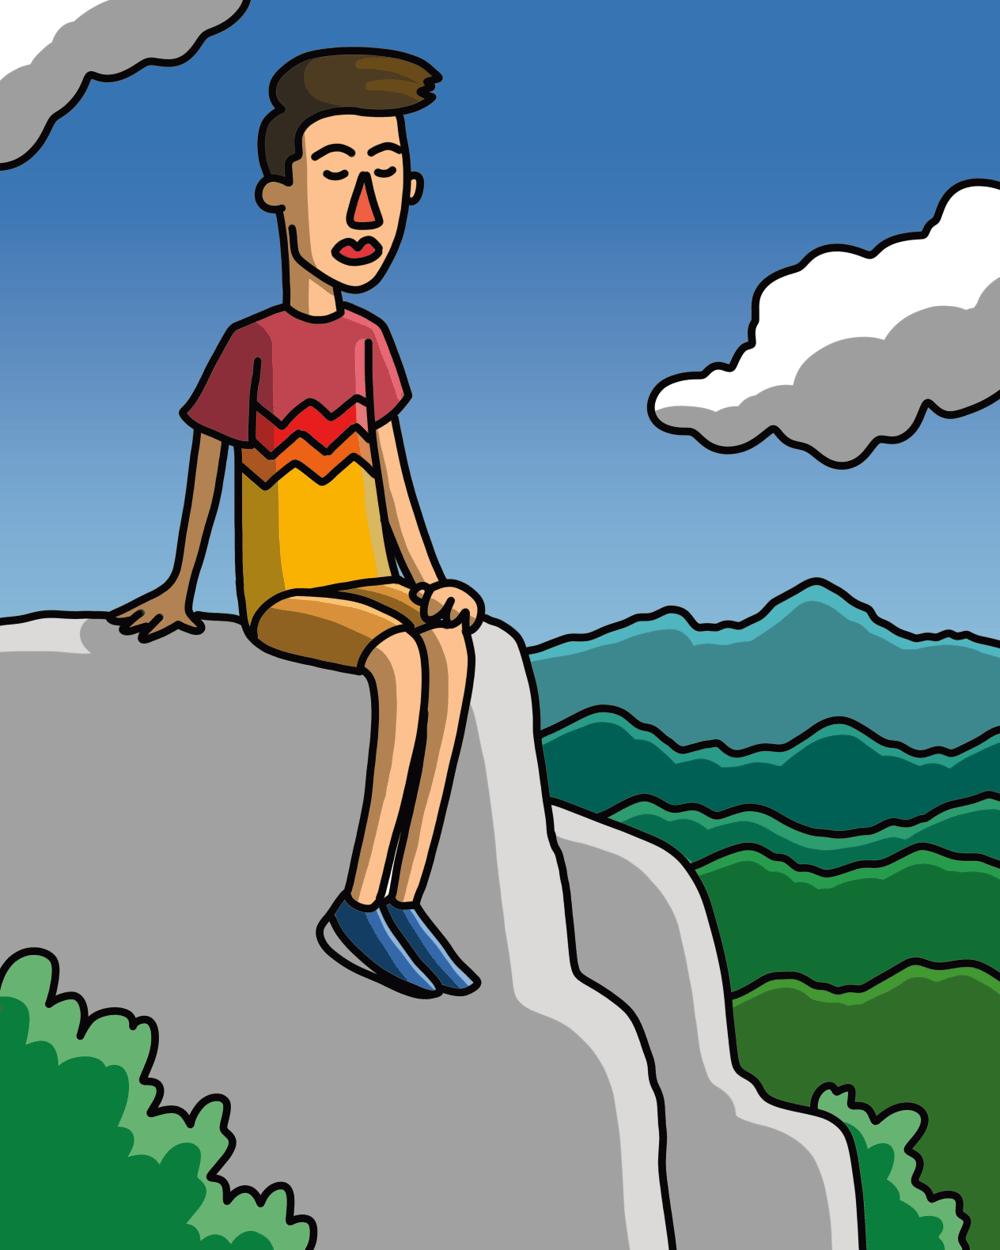 A Traveling Soul - Self Portrait - image 2 - student project